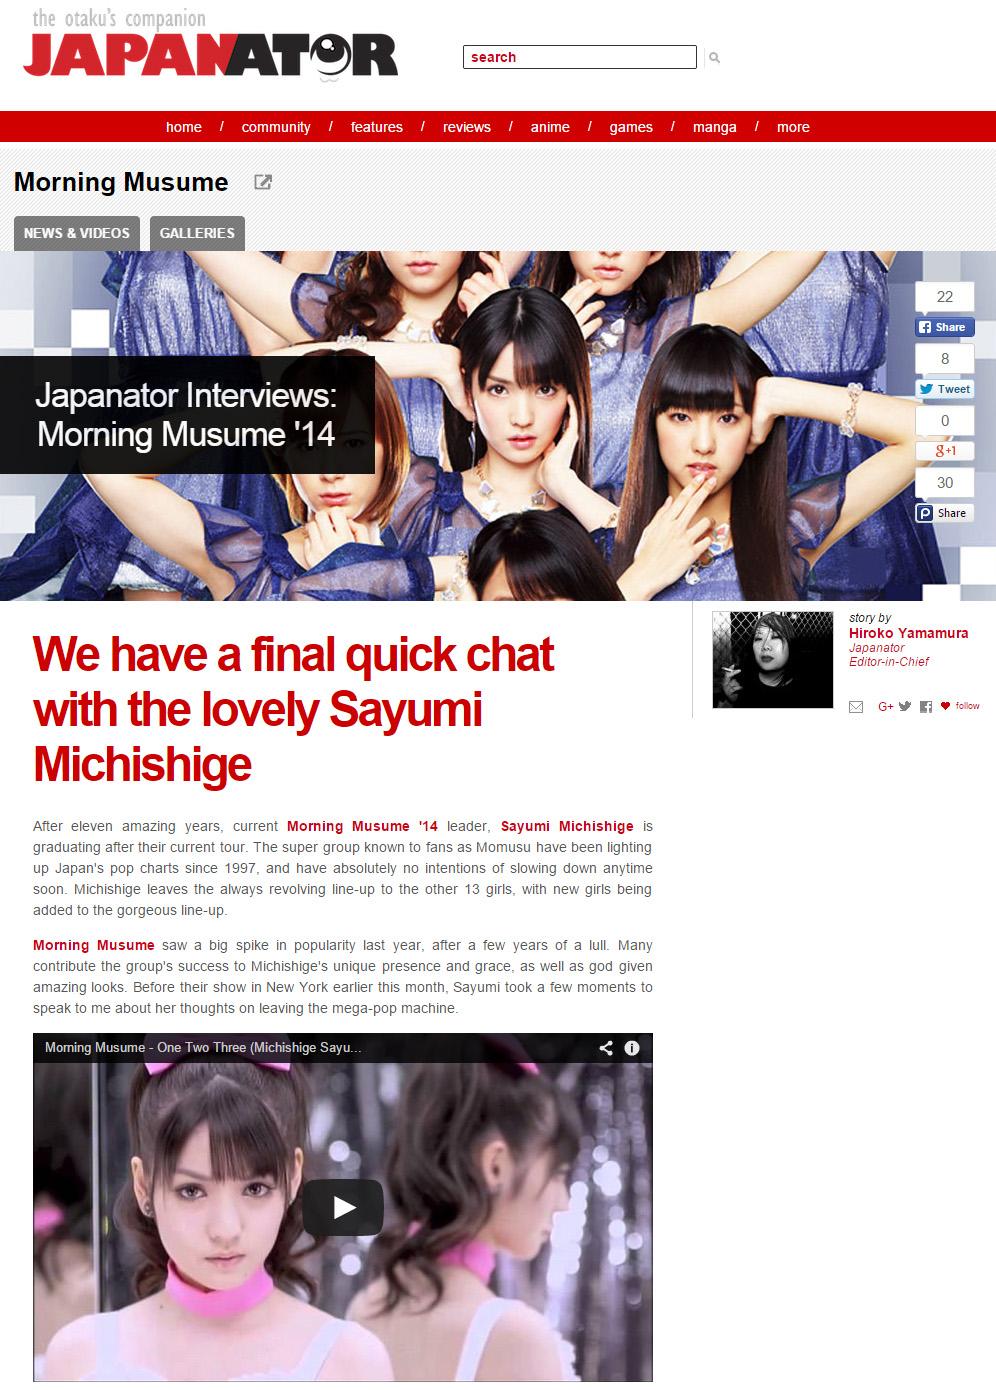 RMMS-Morning-Musume-14-Sayumi-Michishige-Japanator-Interview-2014